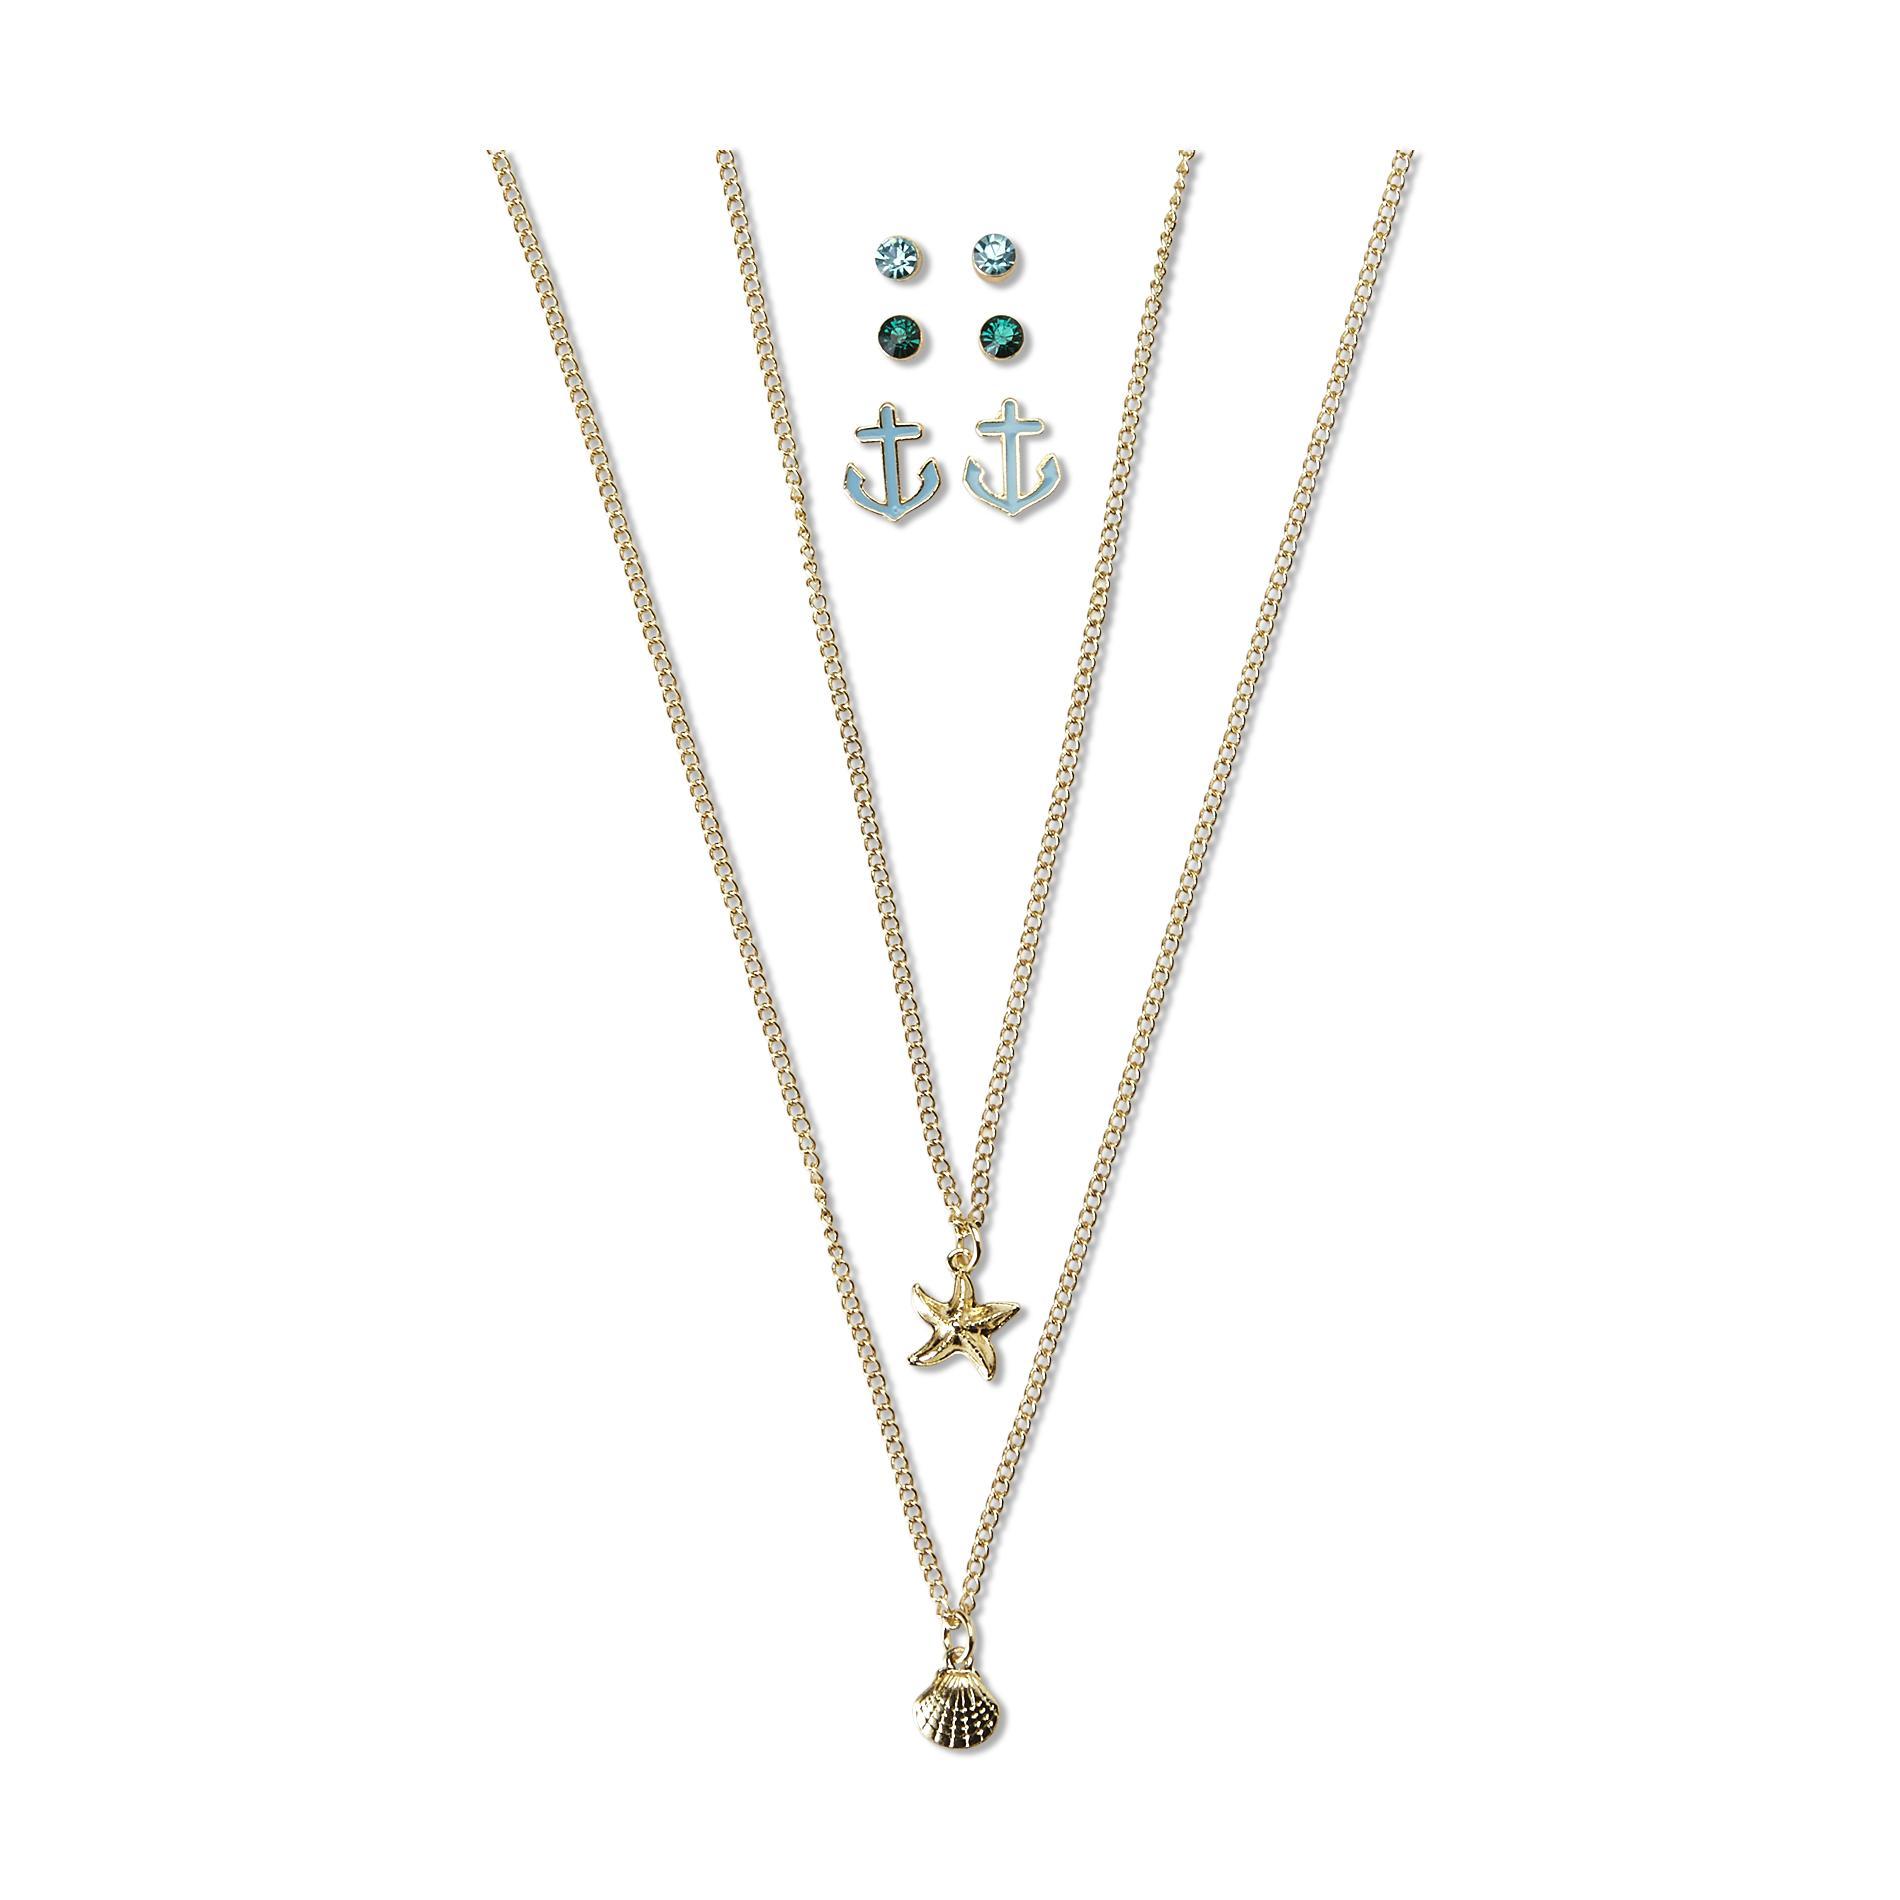 Joe Boxer Women's 2 Goldtone Necklaces & 3-Pairs Earrings - Nautical